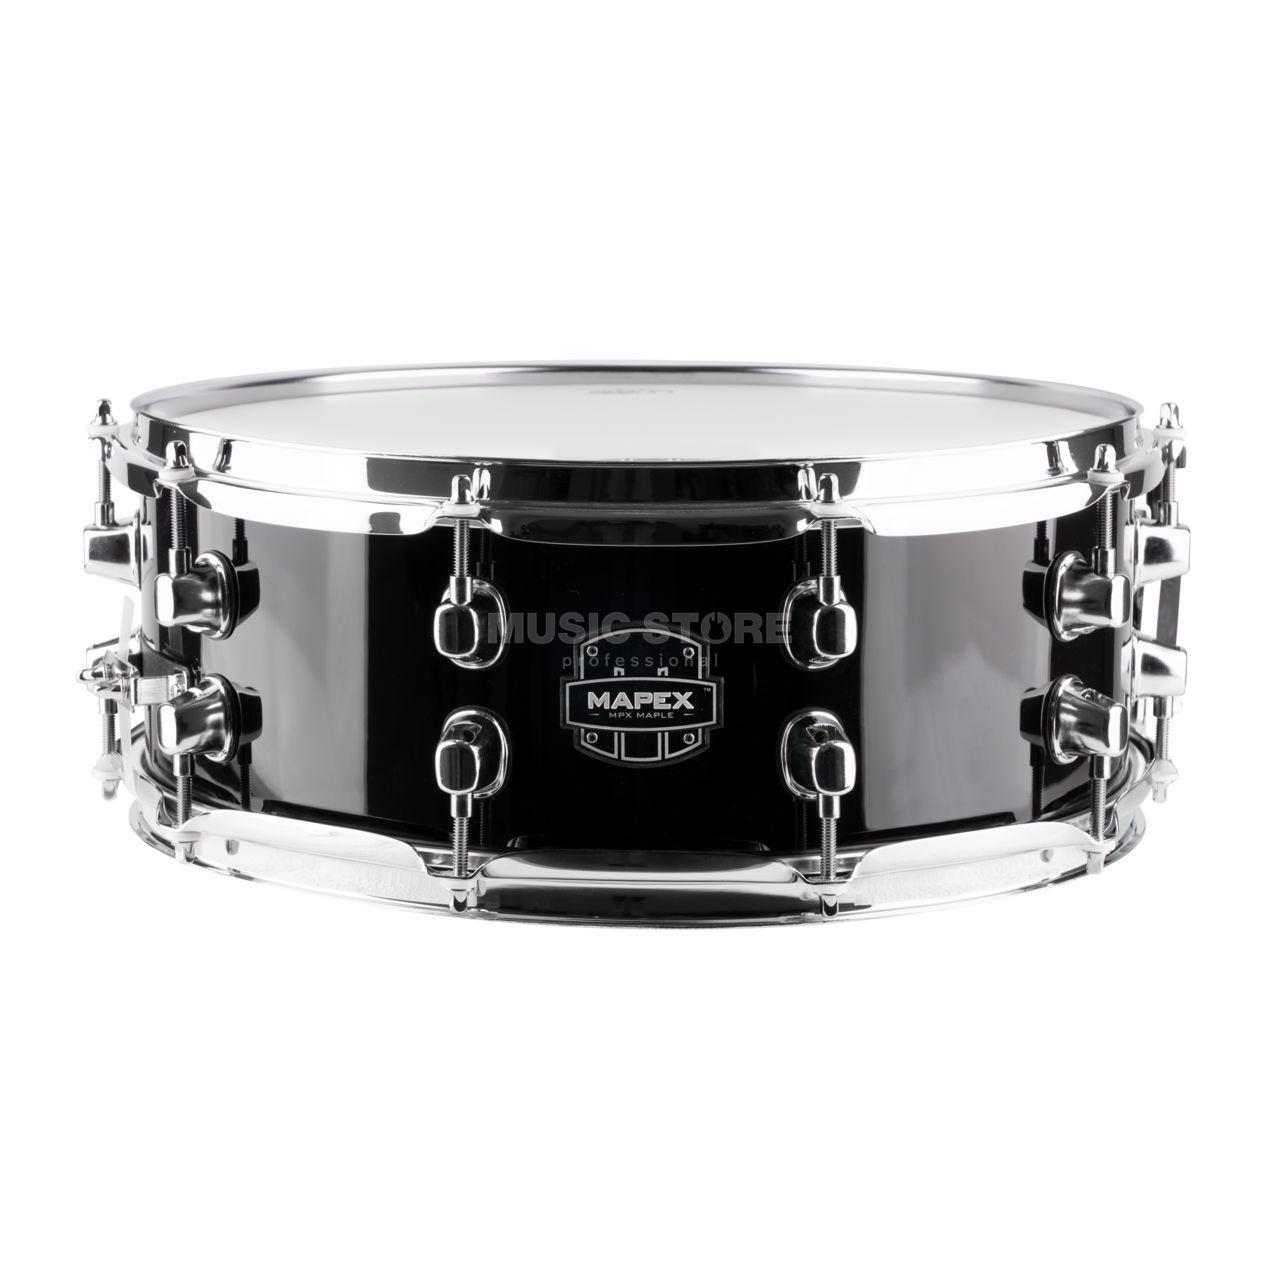 14x5,5 MPX Maple Dark Black #DK MAPEX Snare MXMPML4550DK *Limited Edition